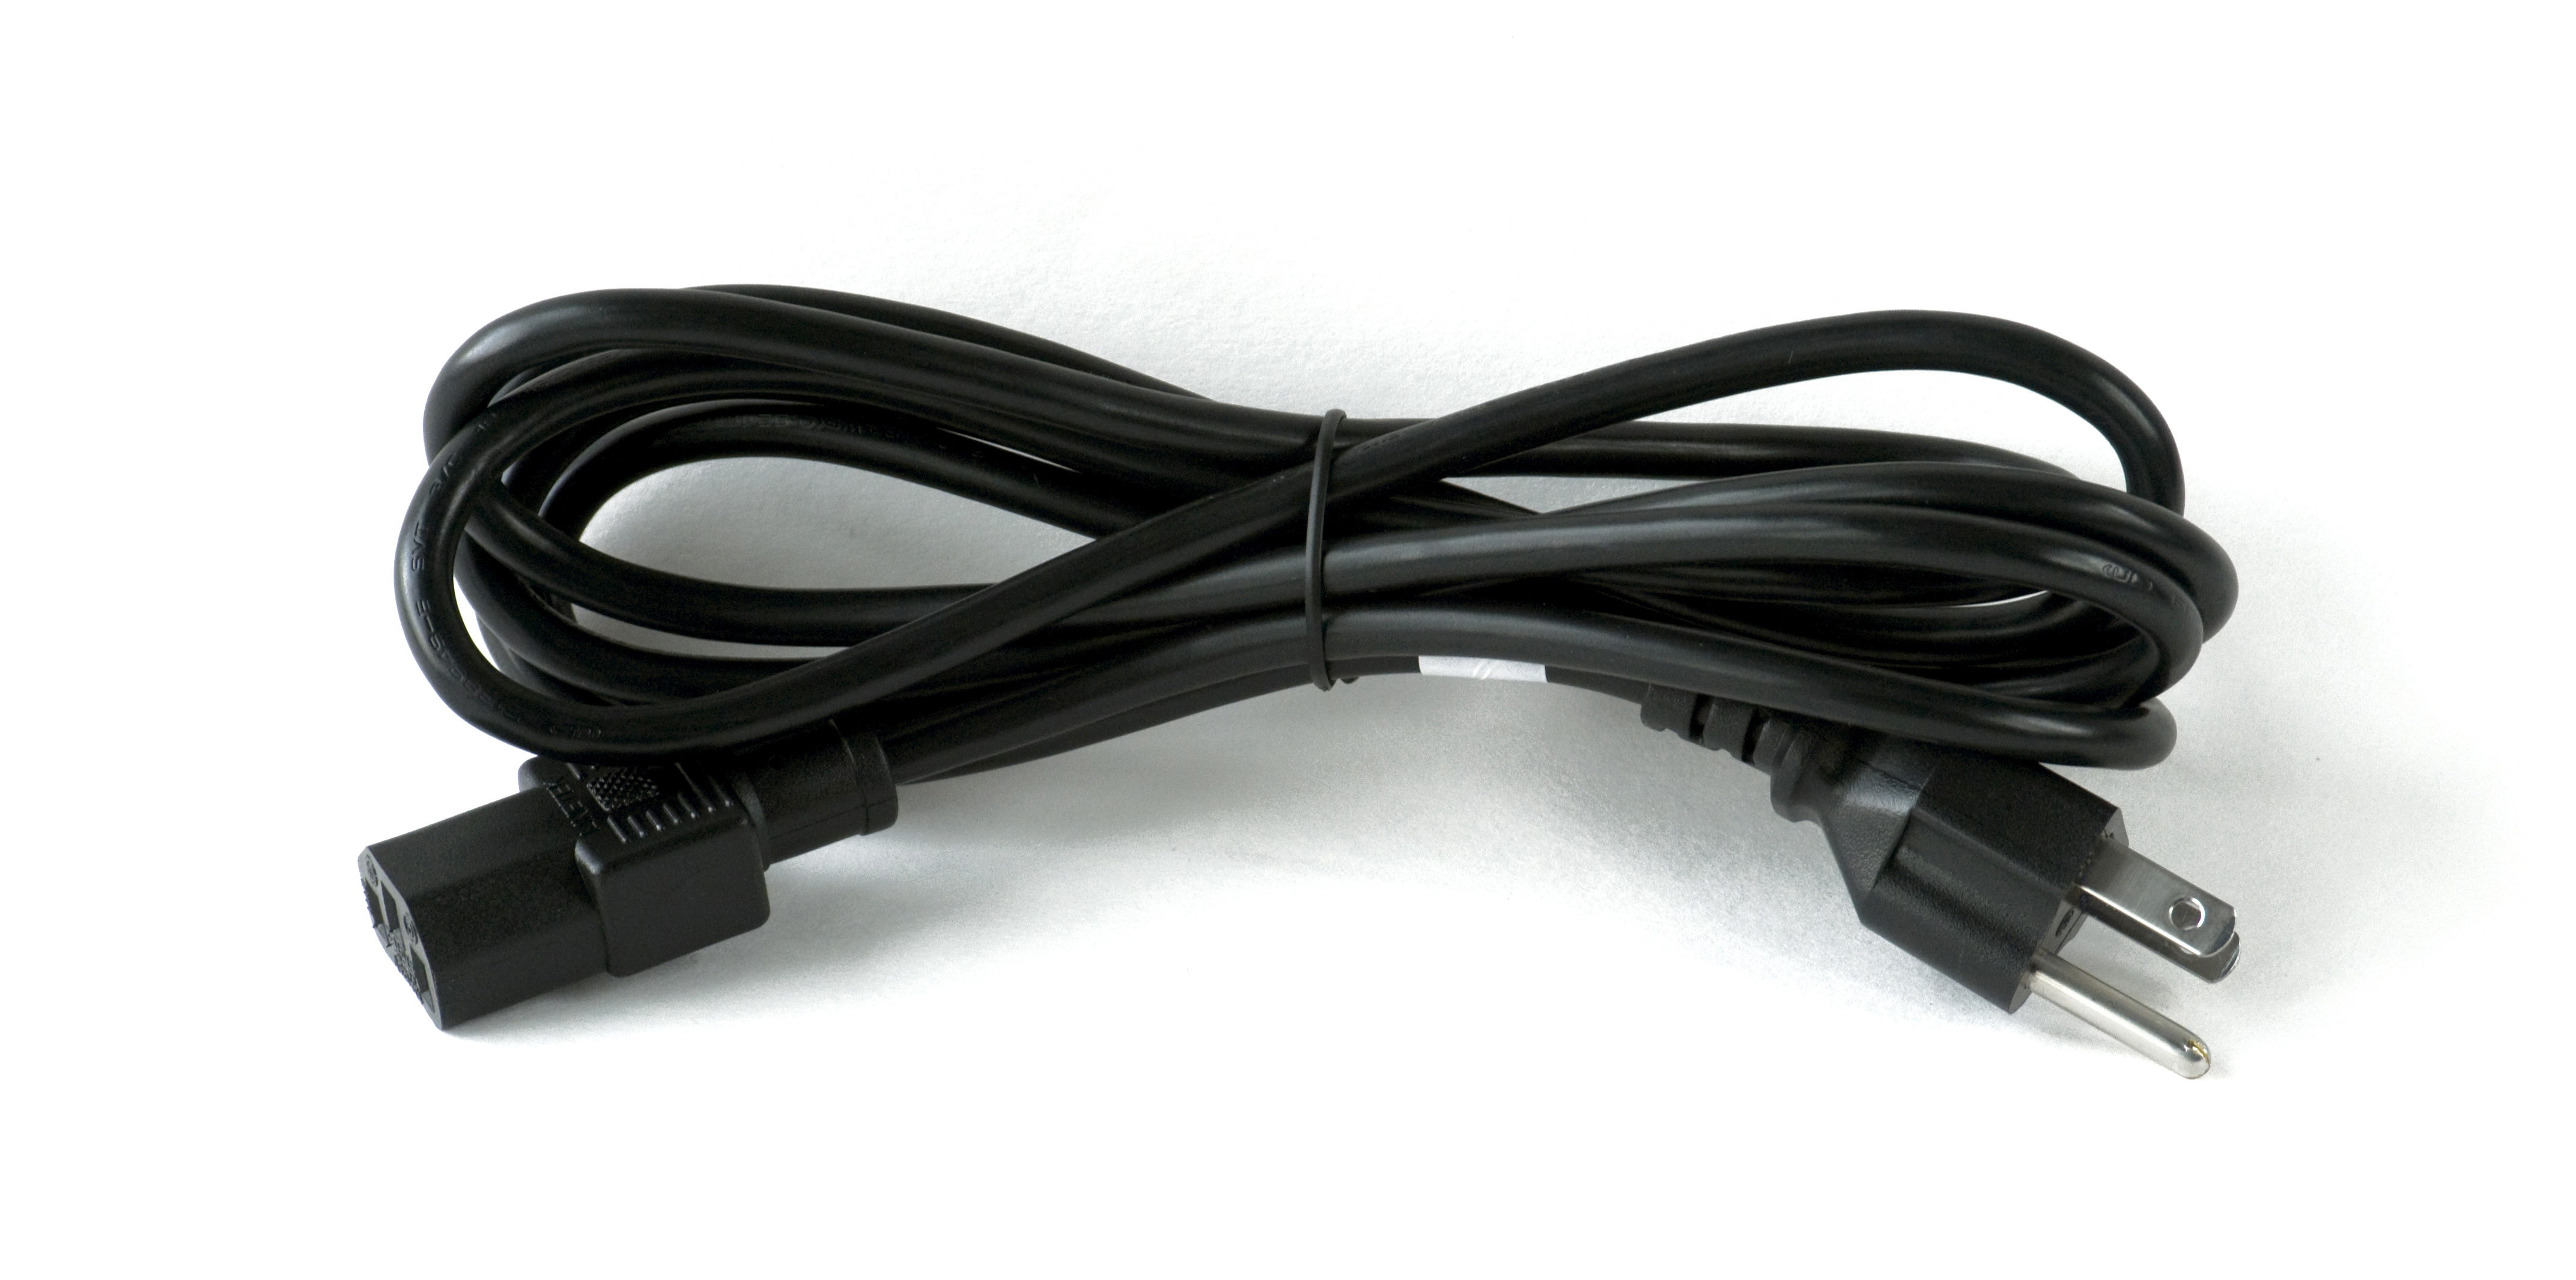 Datalogic Stromkabel - IEC 60320 C13 bis NEMA 5-15 (M)